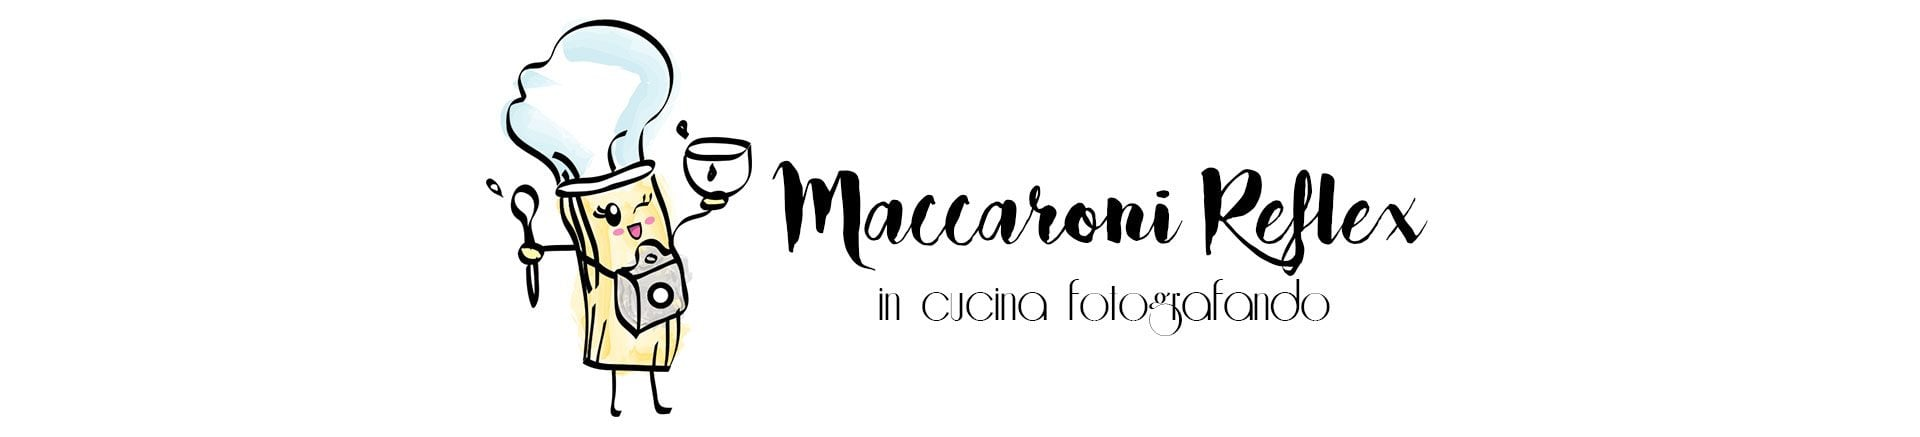 Maccaroni Reflex – in cucina fotografando